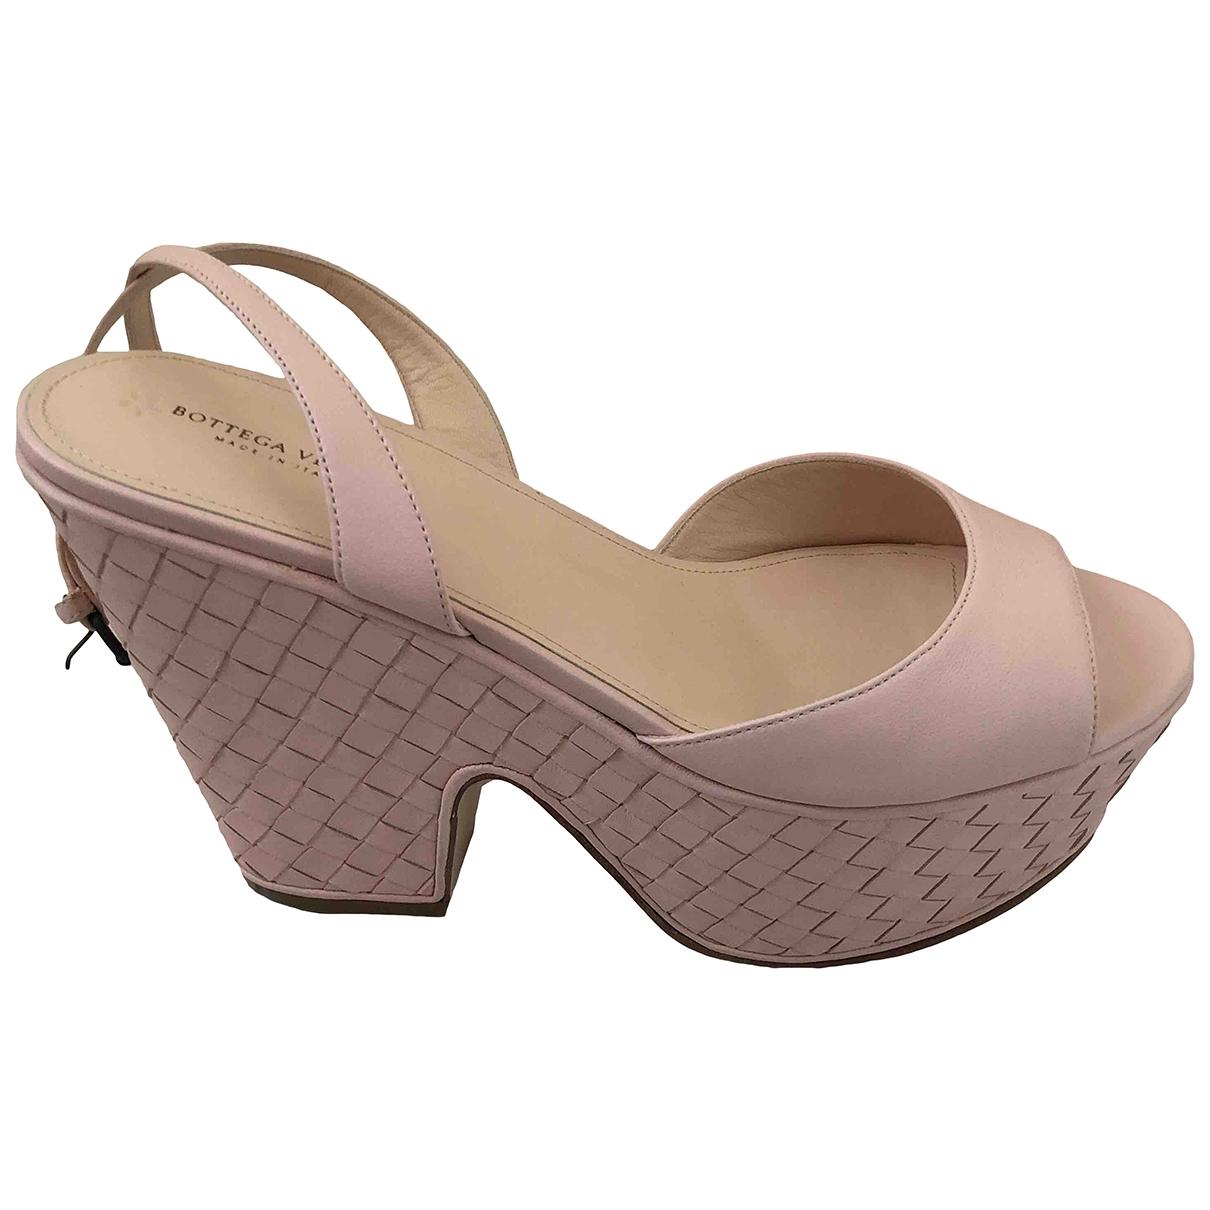 Bottega Veneta - Sandales   pour femme en cuir - rose